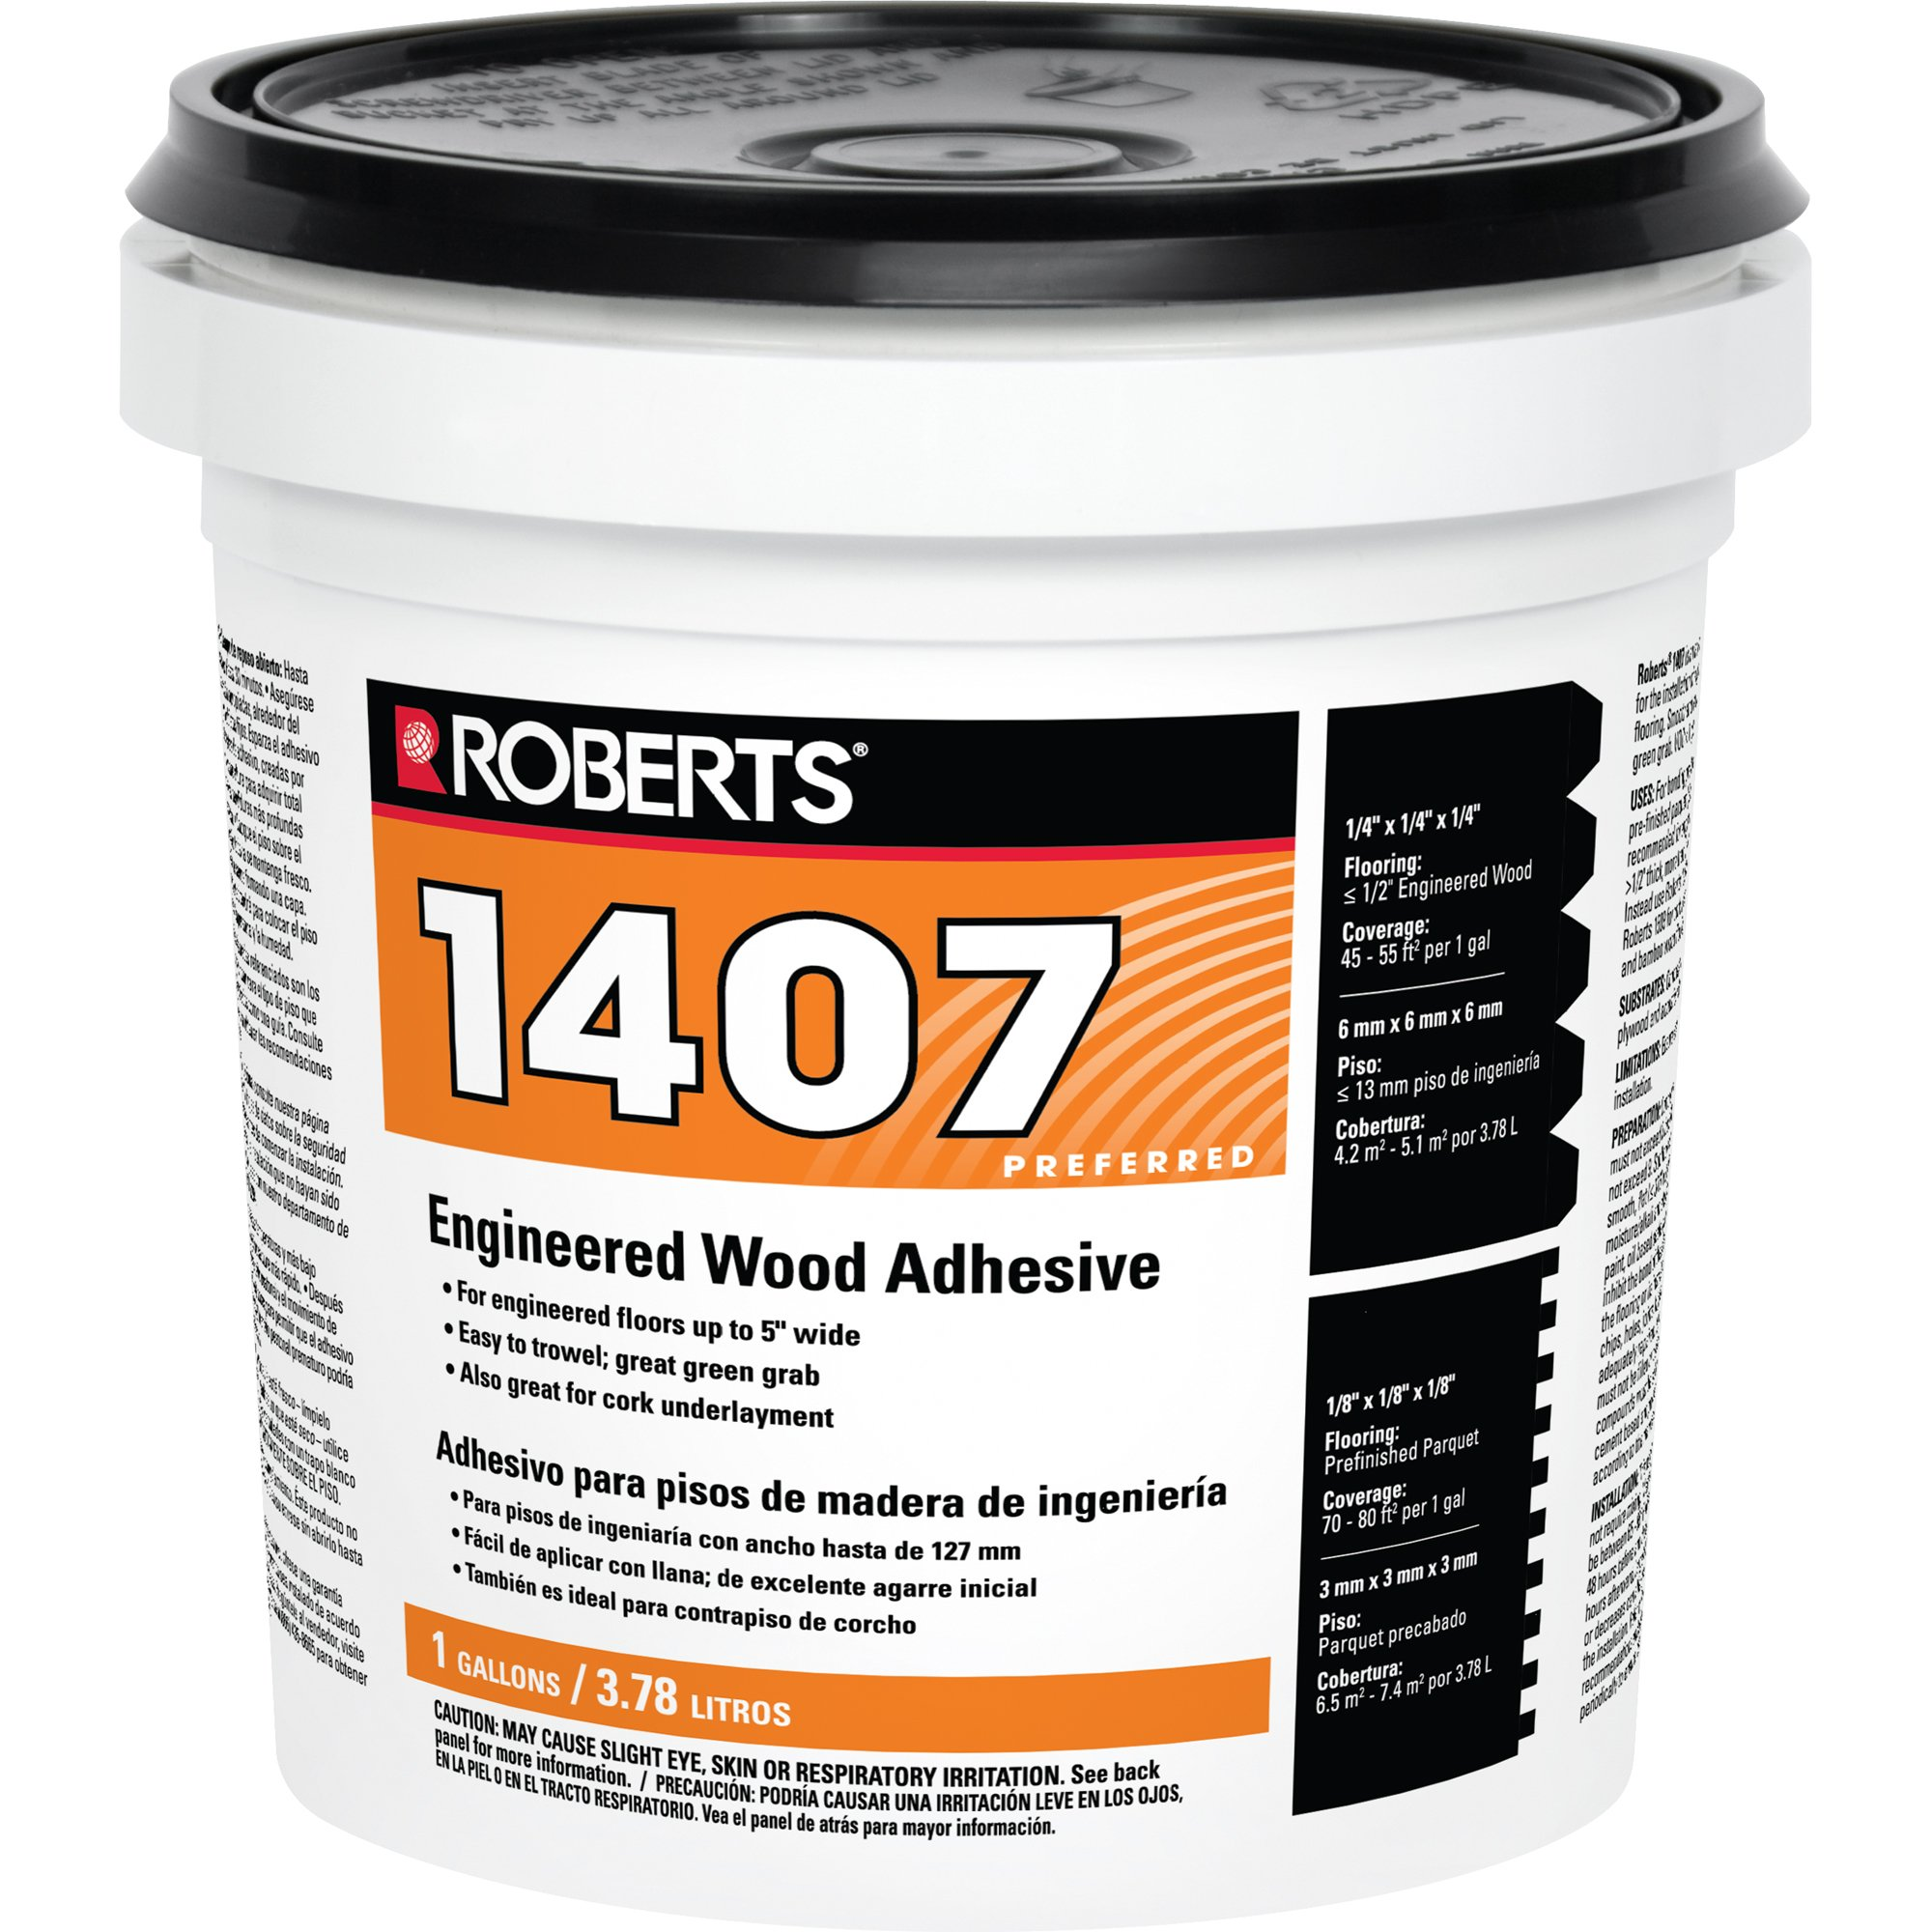 Roberts 1407-1 Engineered Wood Flooring Adhesive Glue, 1 Gallon